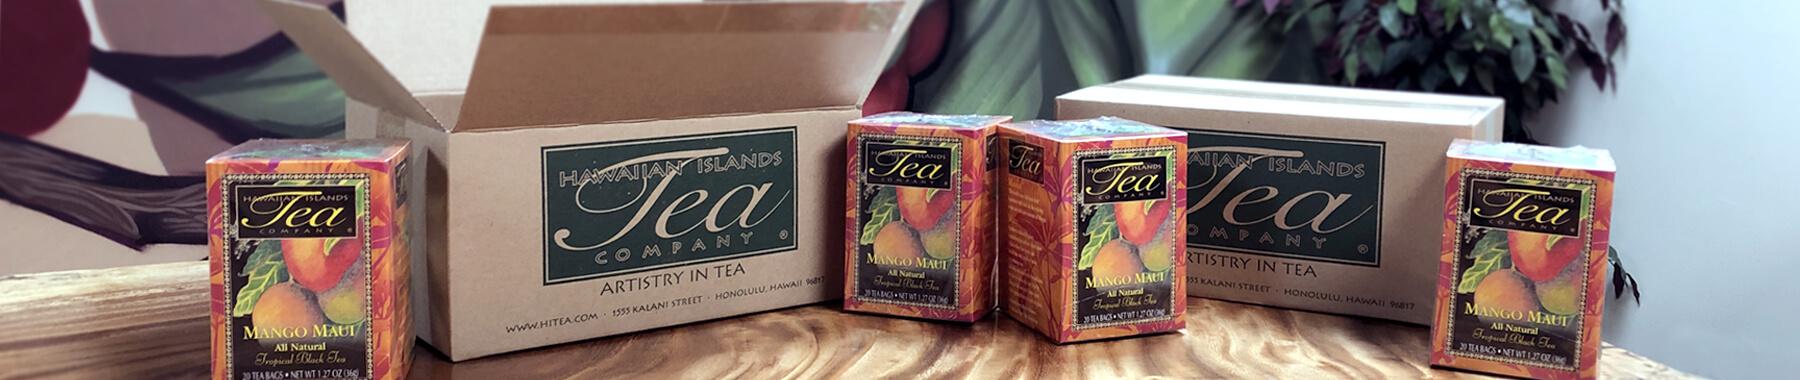 tea-cases-header.jpg